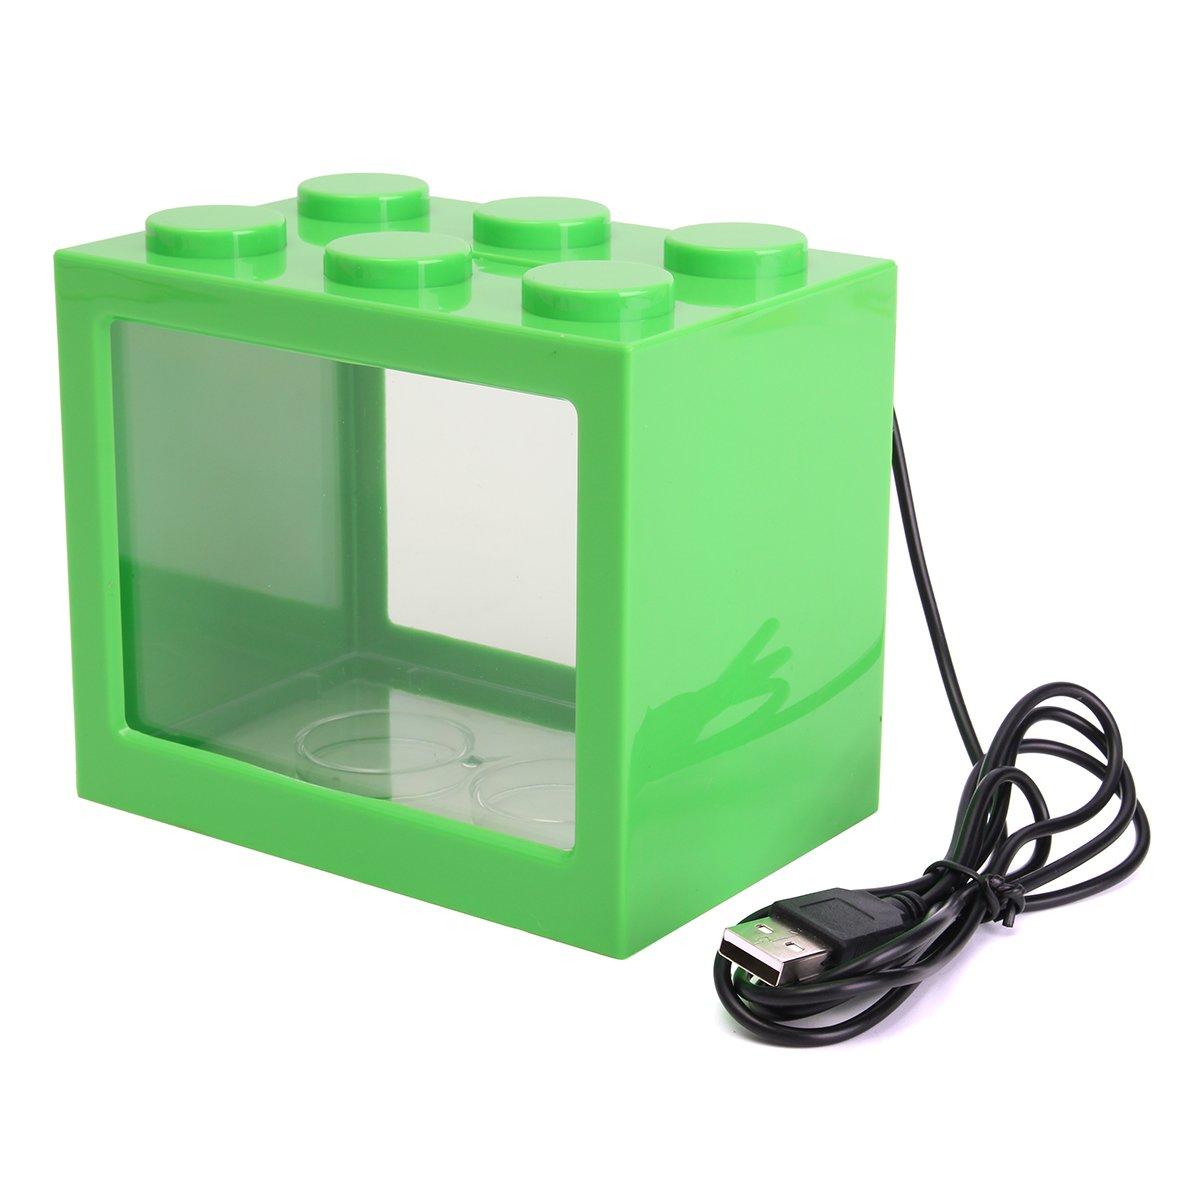 Green Isali USB LED Light Clear Fish Tank Isali Aquarium Box Bettas Office Desktop Decor (color  Green) Fish & Aquatic Pets Aquarium Fish Tank